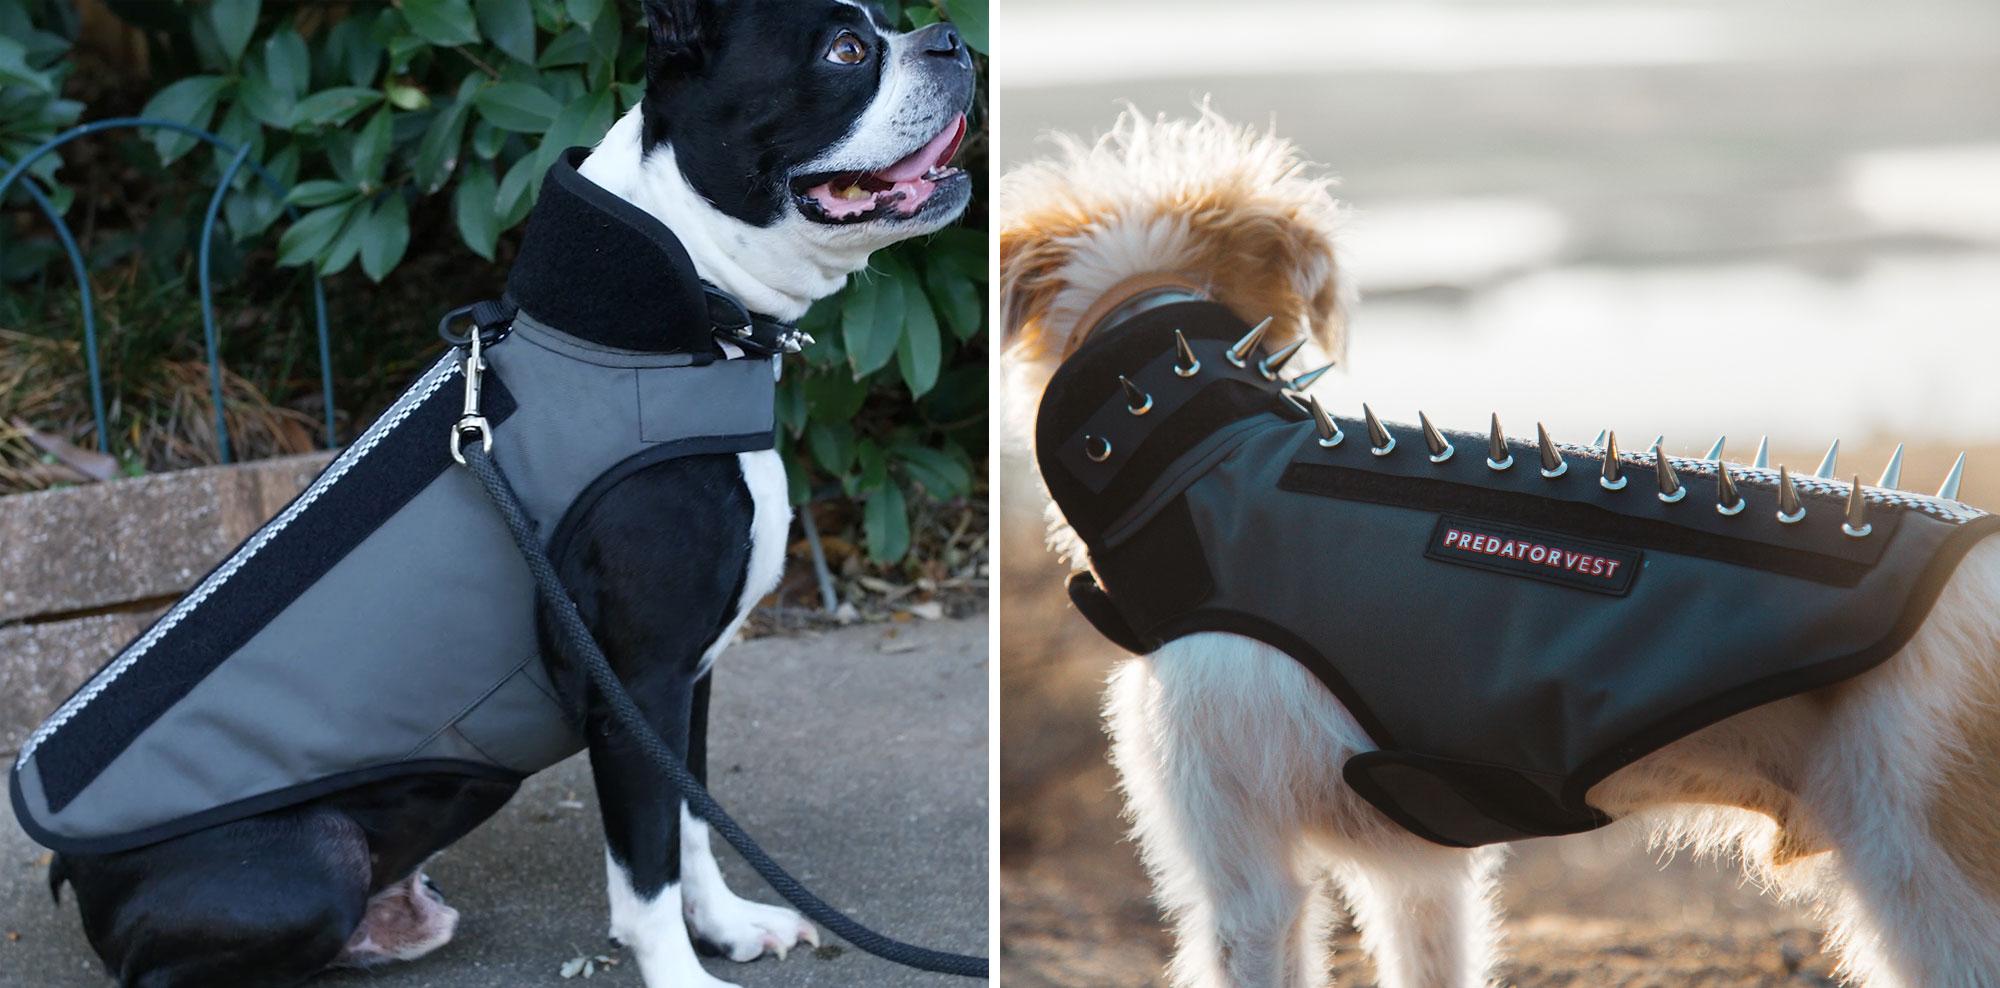 info for a733f e9b0f Predator Vest™ - Puncture Resistant Pet Armor Deters Coyote ...